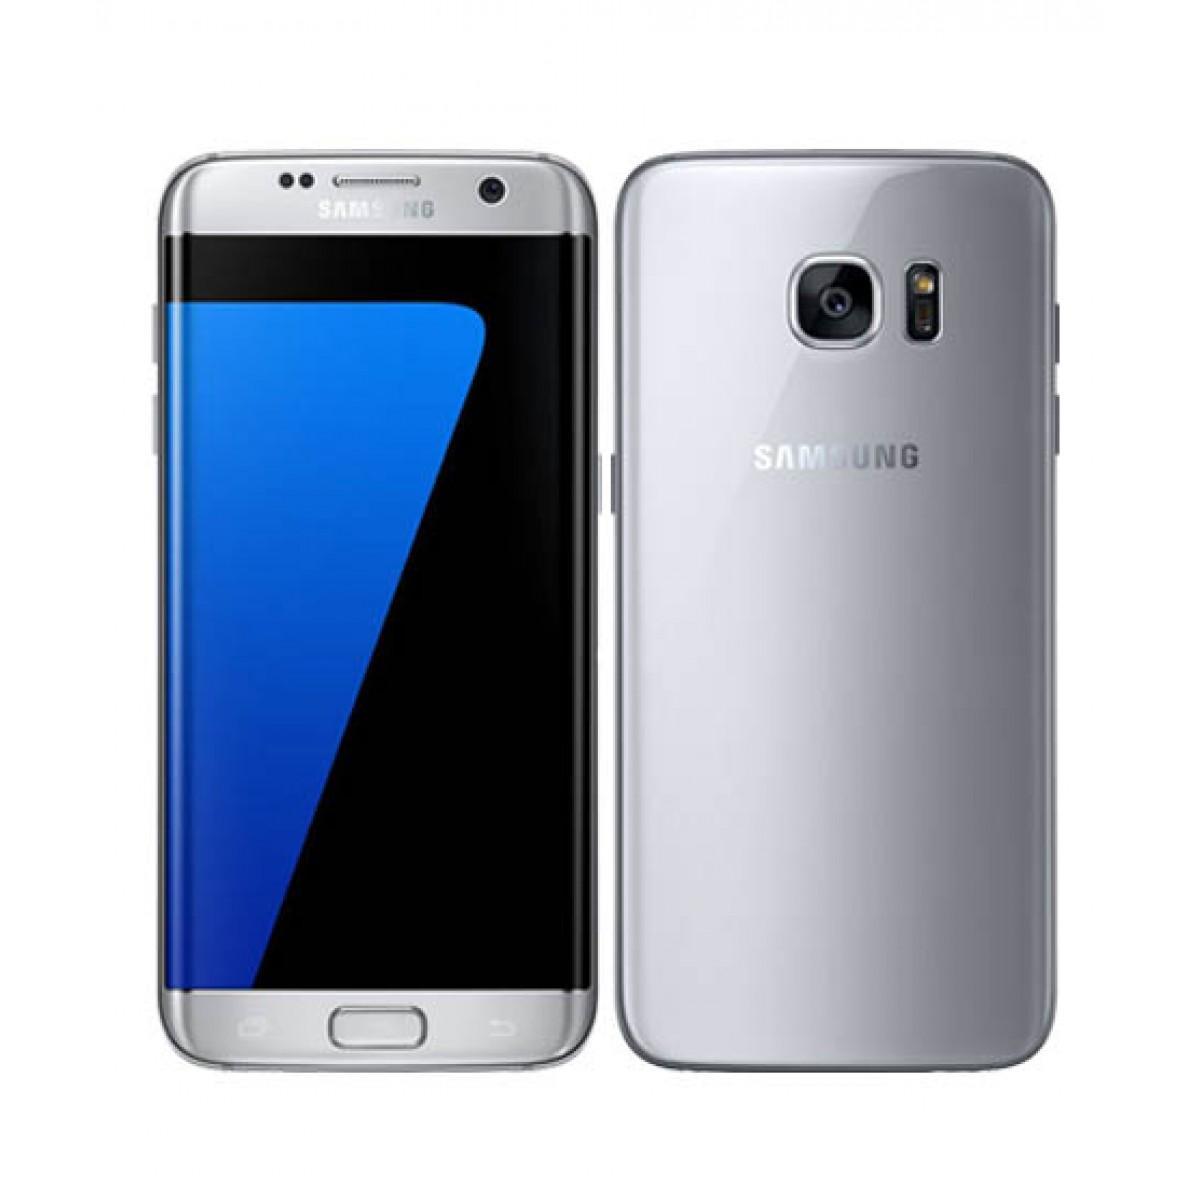 "Smartphone 5.5"" Samsung Galaxy S7 Edge G935FD Argent - Double SIM, 32 Go (Boite ouverte)"